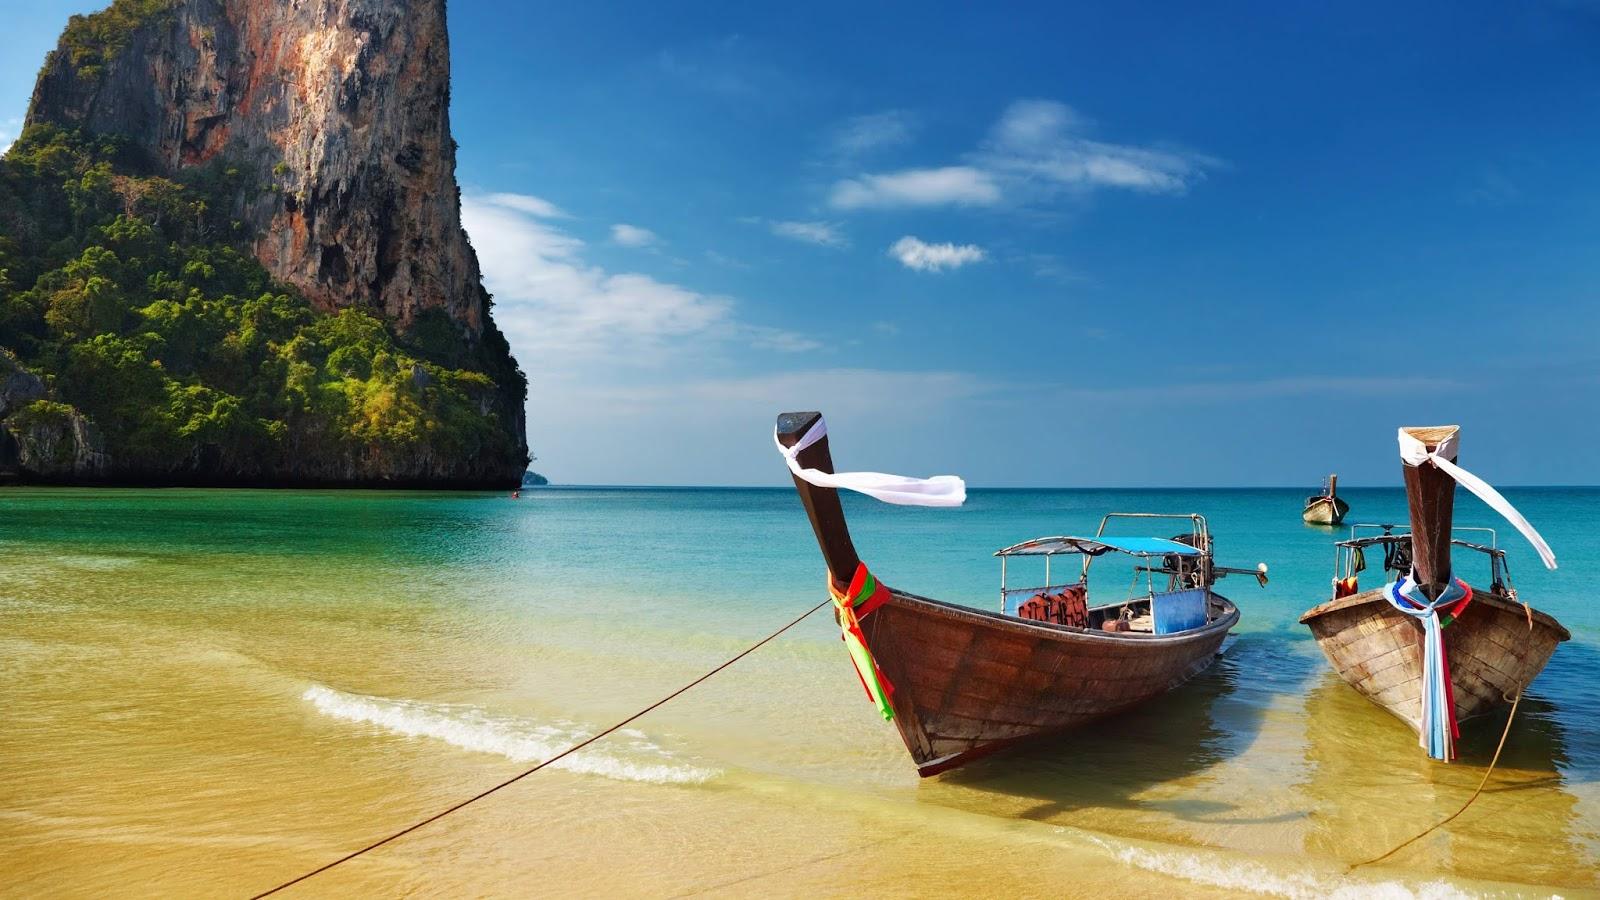 Amazing Images 4k Ultra Hd Beautiful Real Beach Wallpaper